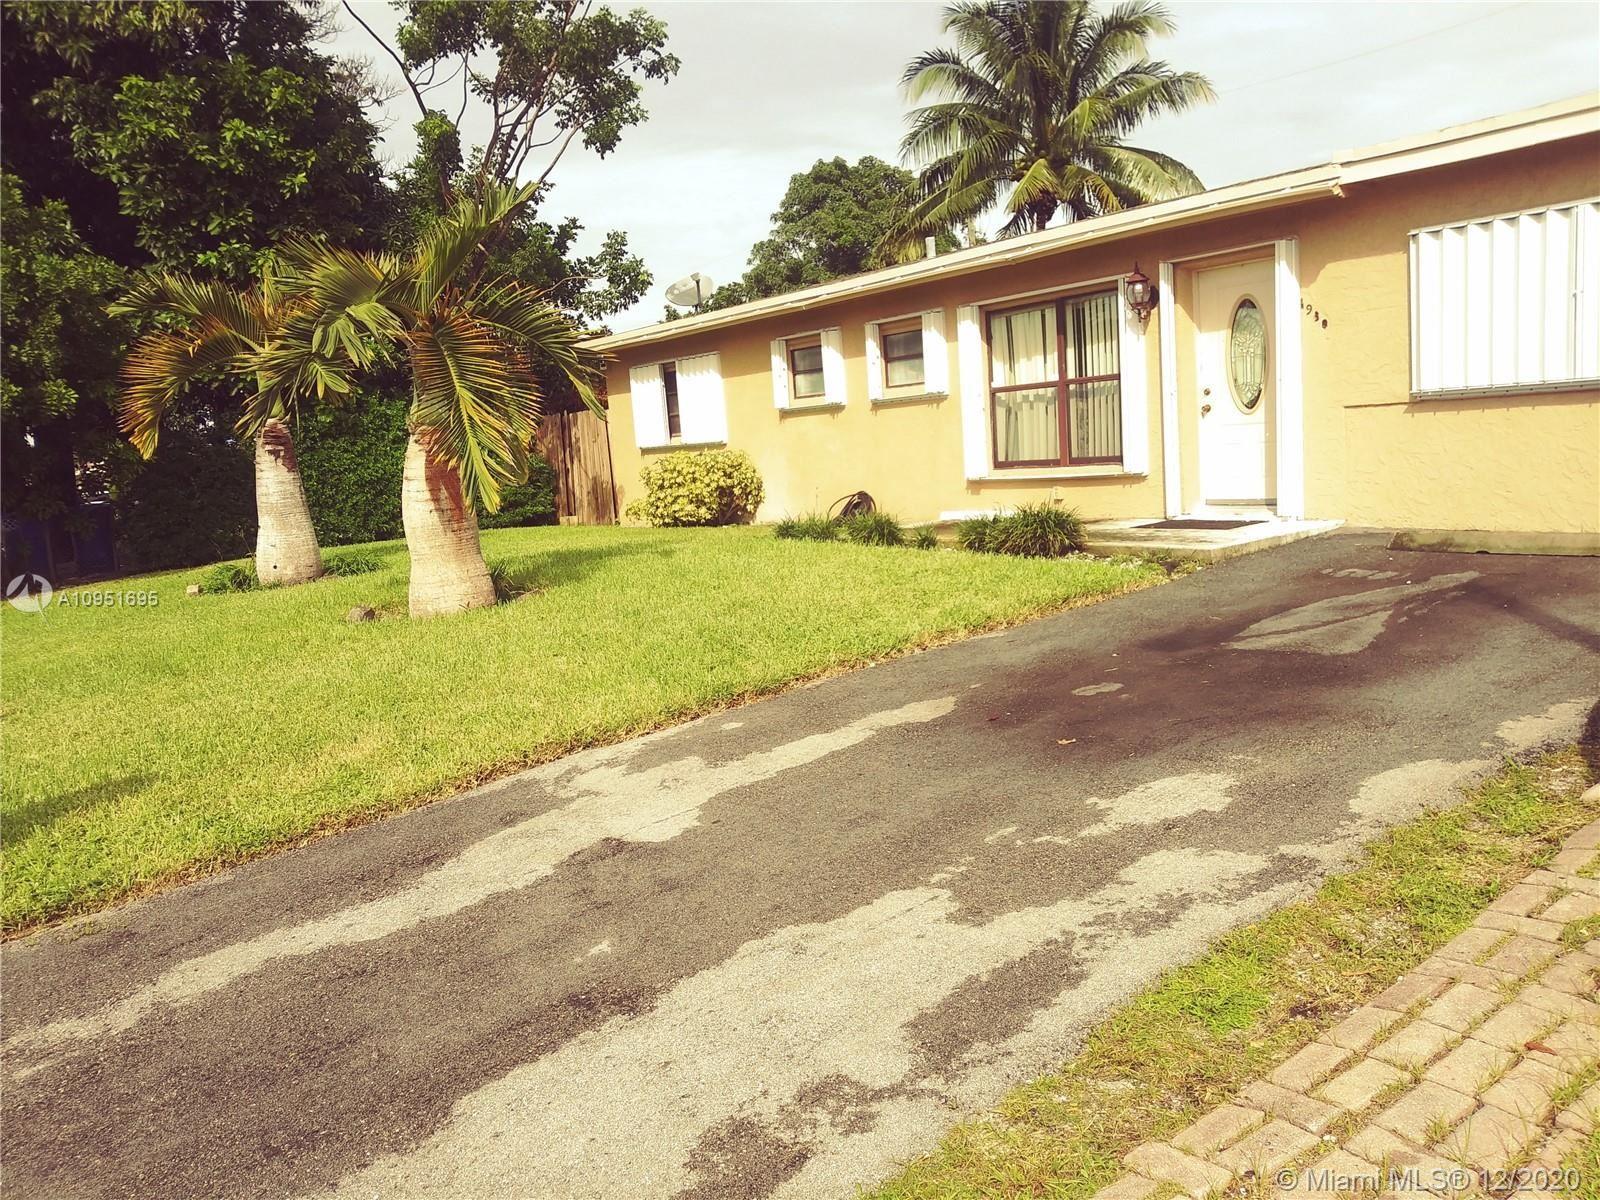 1930 NE 1st Ter, Pompano Beach, FL 33060 - #: A10951695